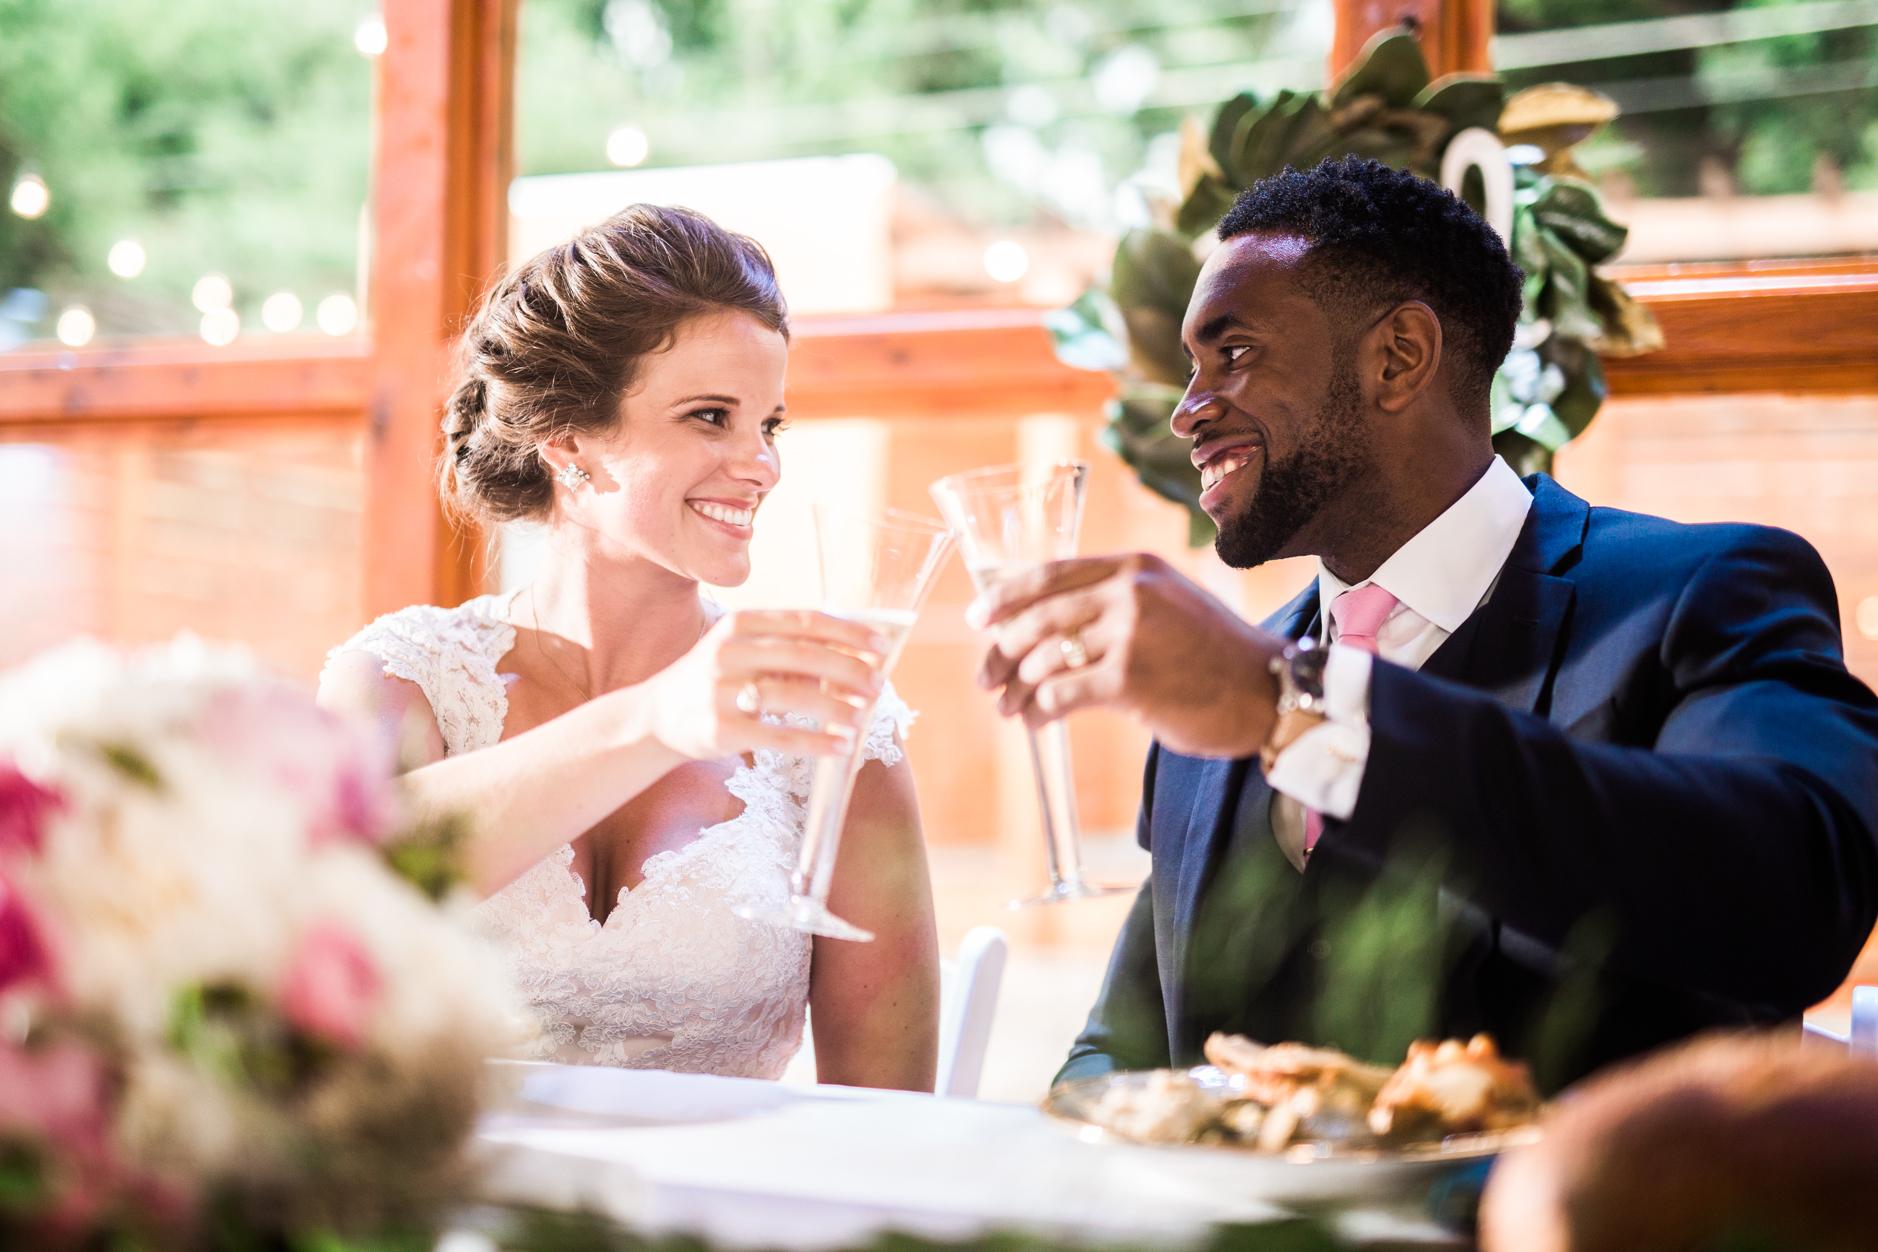 LegacyUnion-Wedding-Photographer-Glendale-CA-61.jpg